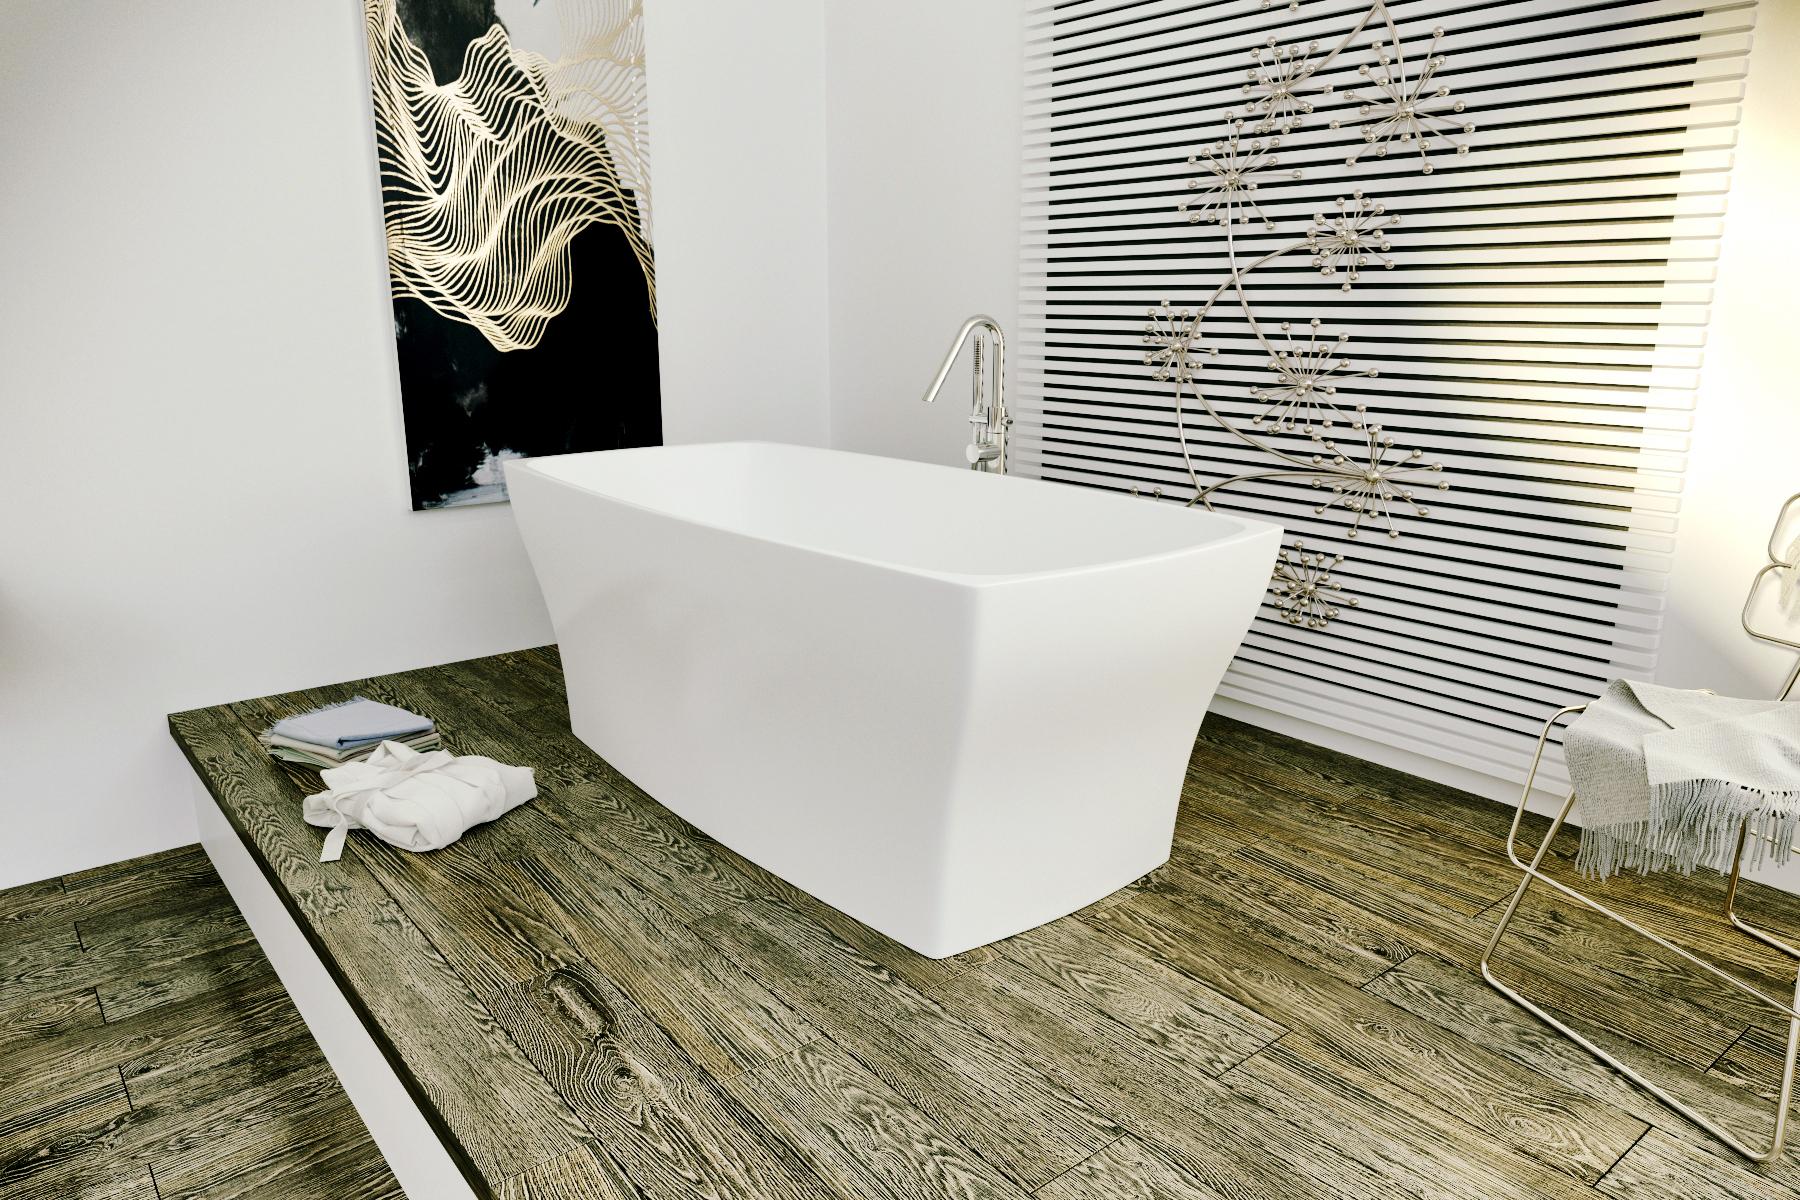 Elise wht la vasca da bagno freestanding aquatica in - Vasca da bagno in pietra ...